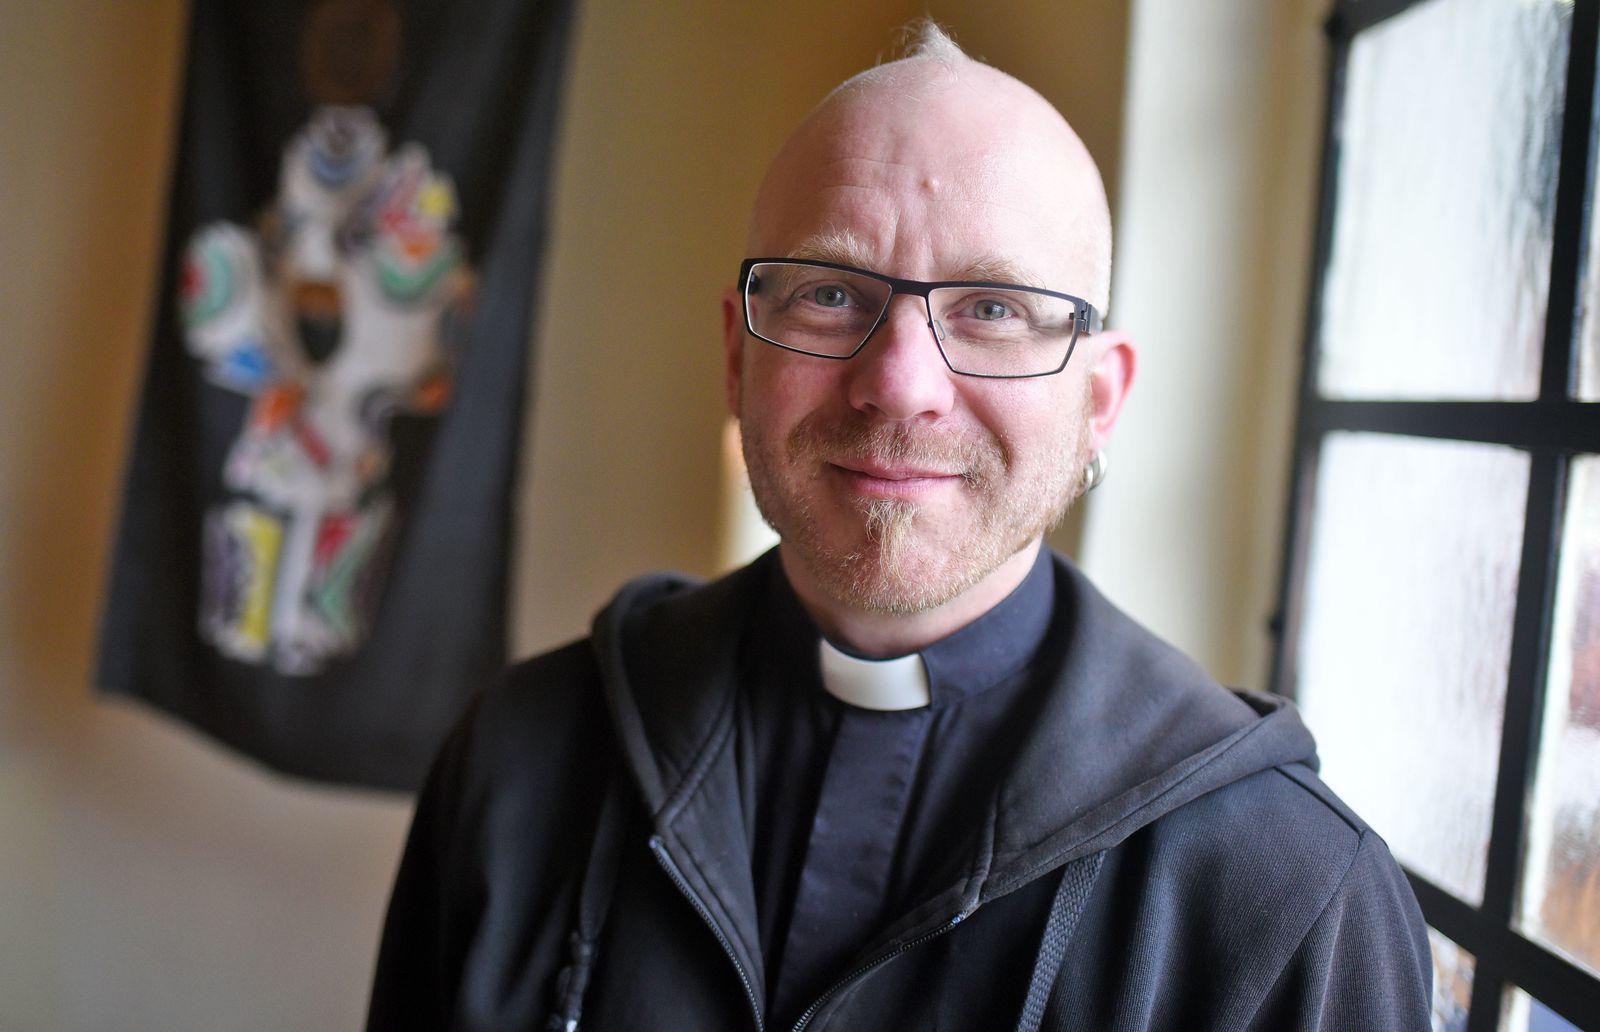 Ines-Paul Baumann/ Pastor